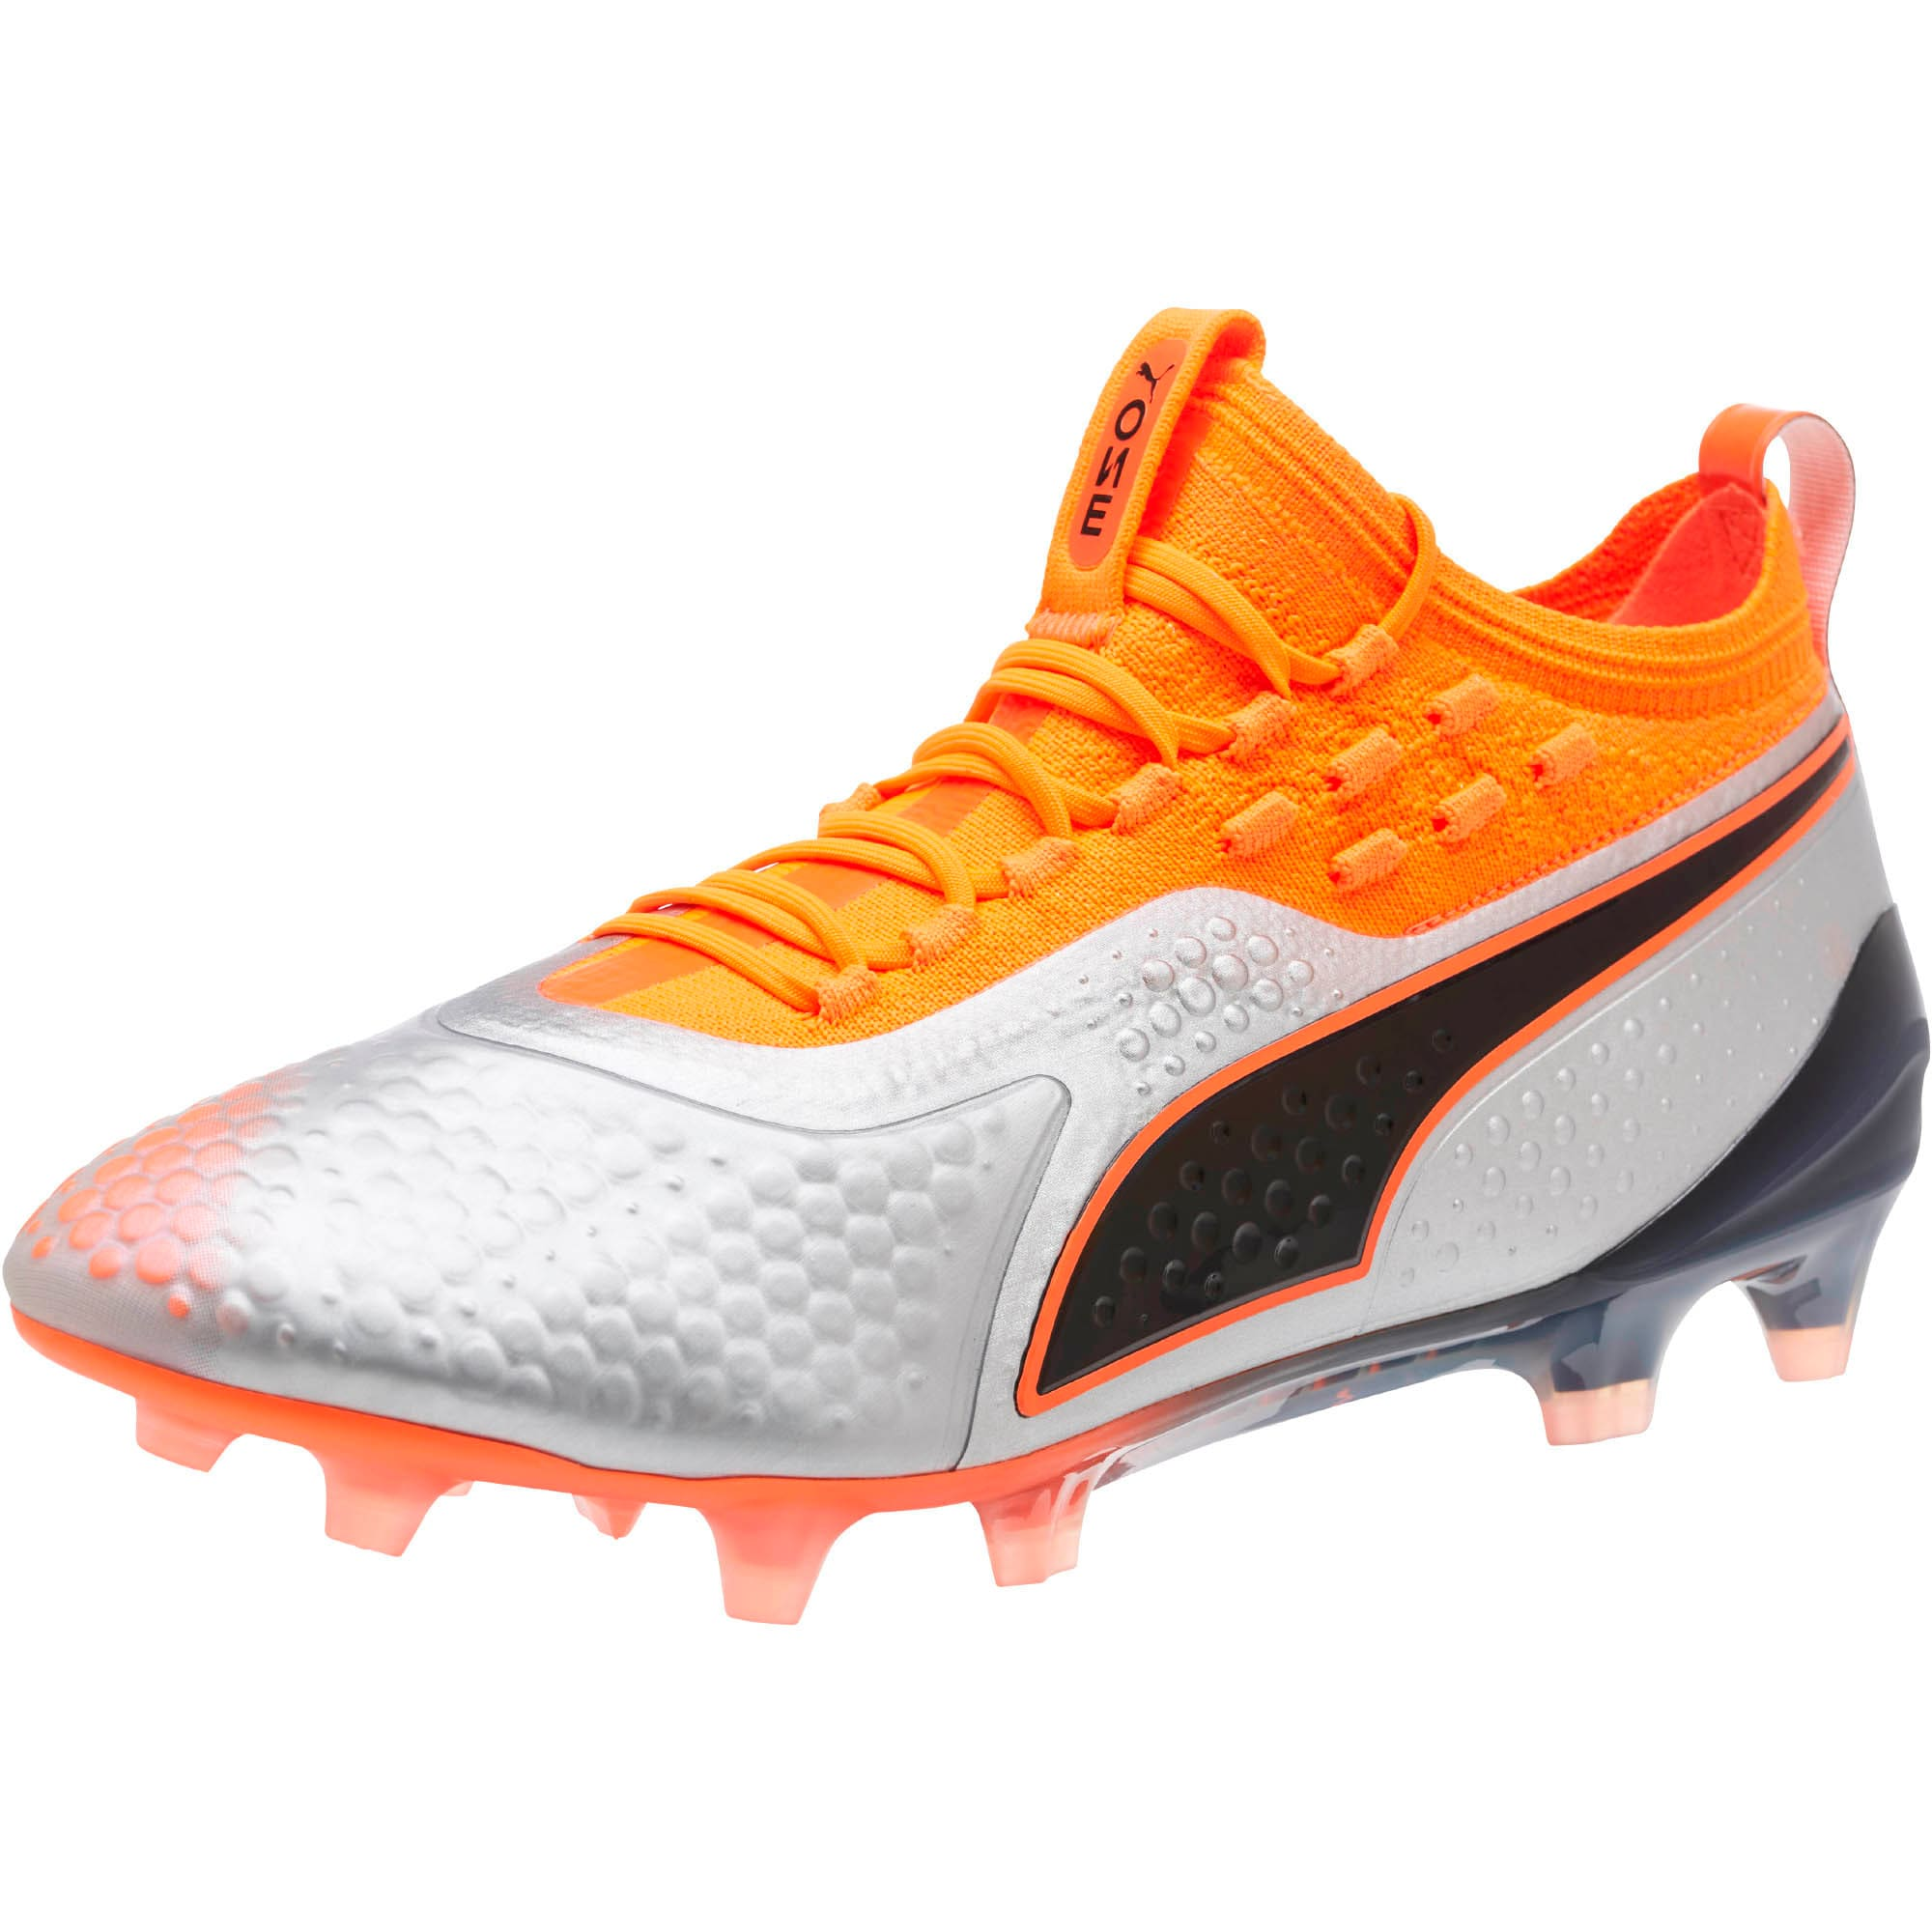 Thumbnail 1 of PUMA ONE 1 FG/AG Men's Soccer Cleats, Silver-Orange-Black, medium